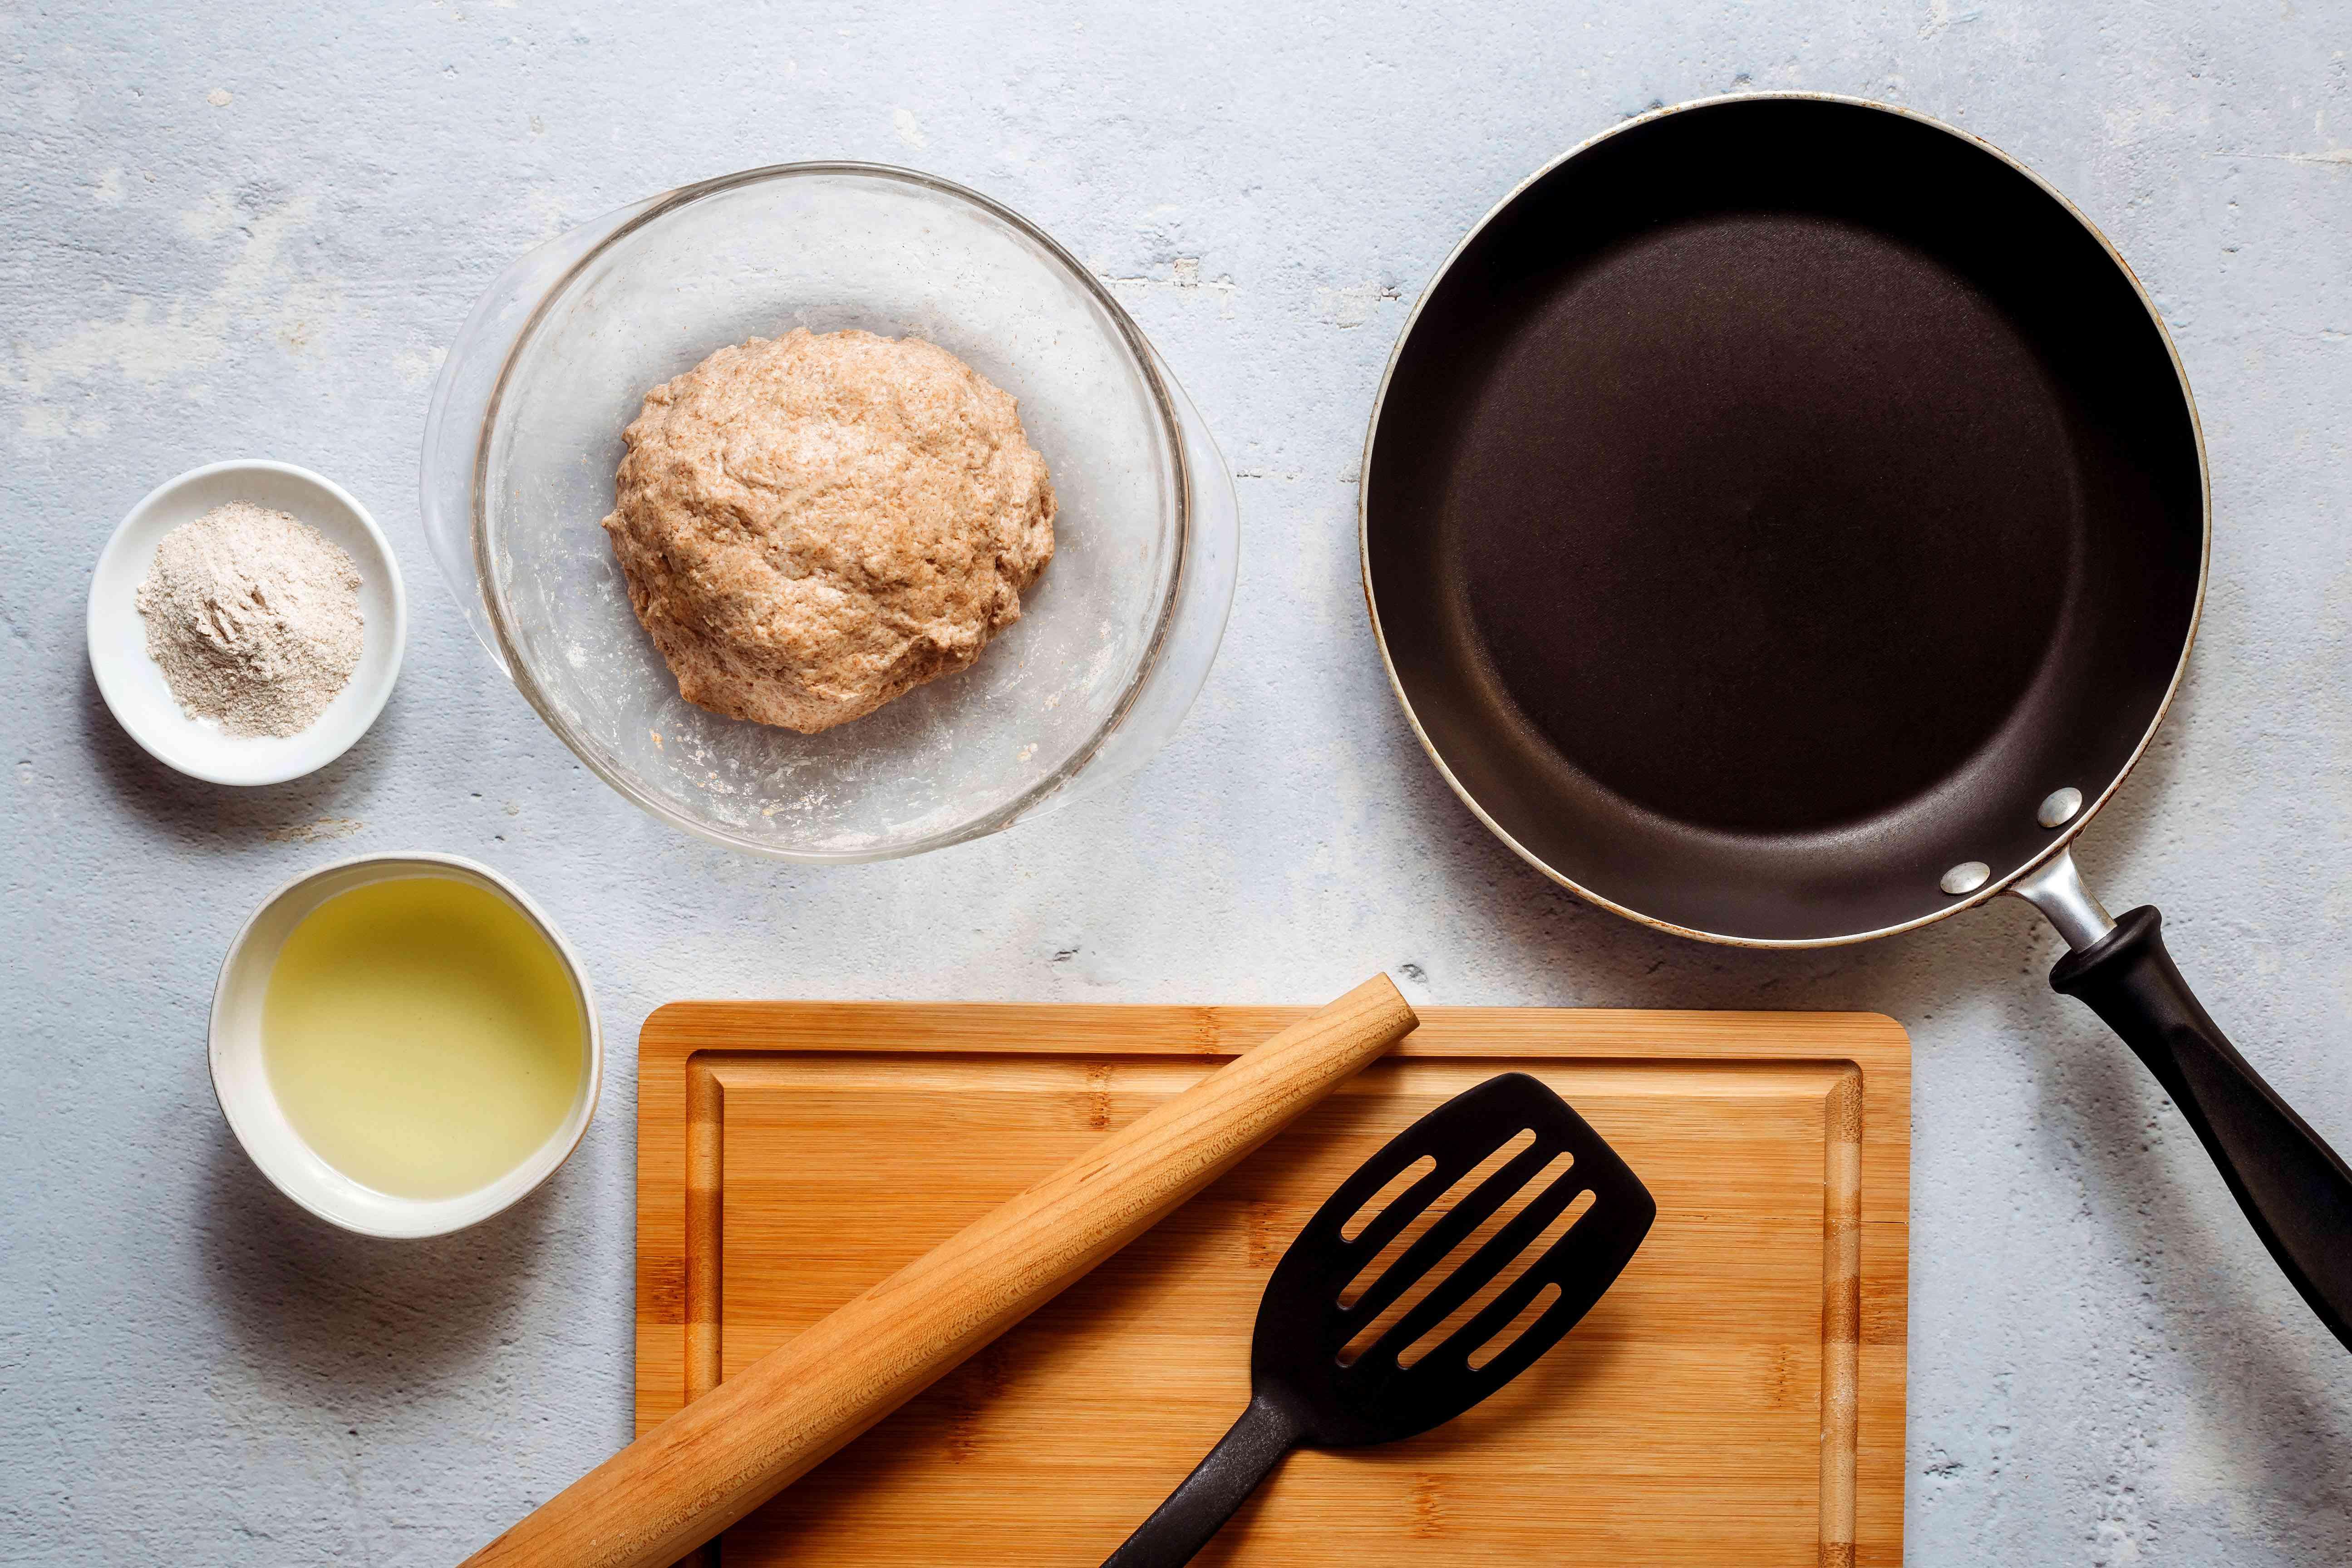 Parathas (Pan-Fried Indian Flatbread) ingredients